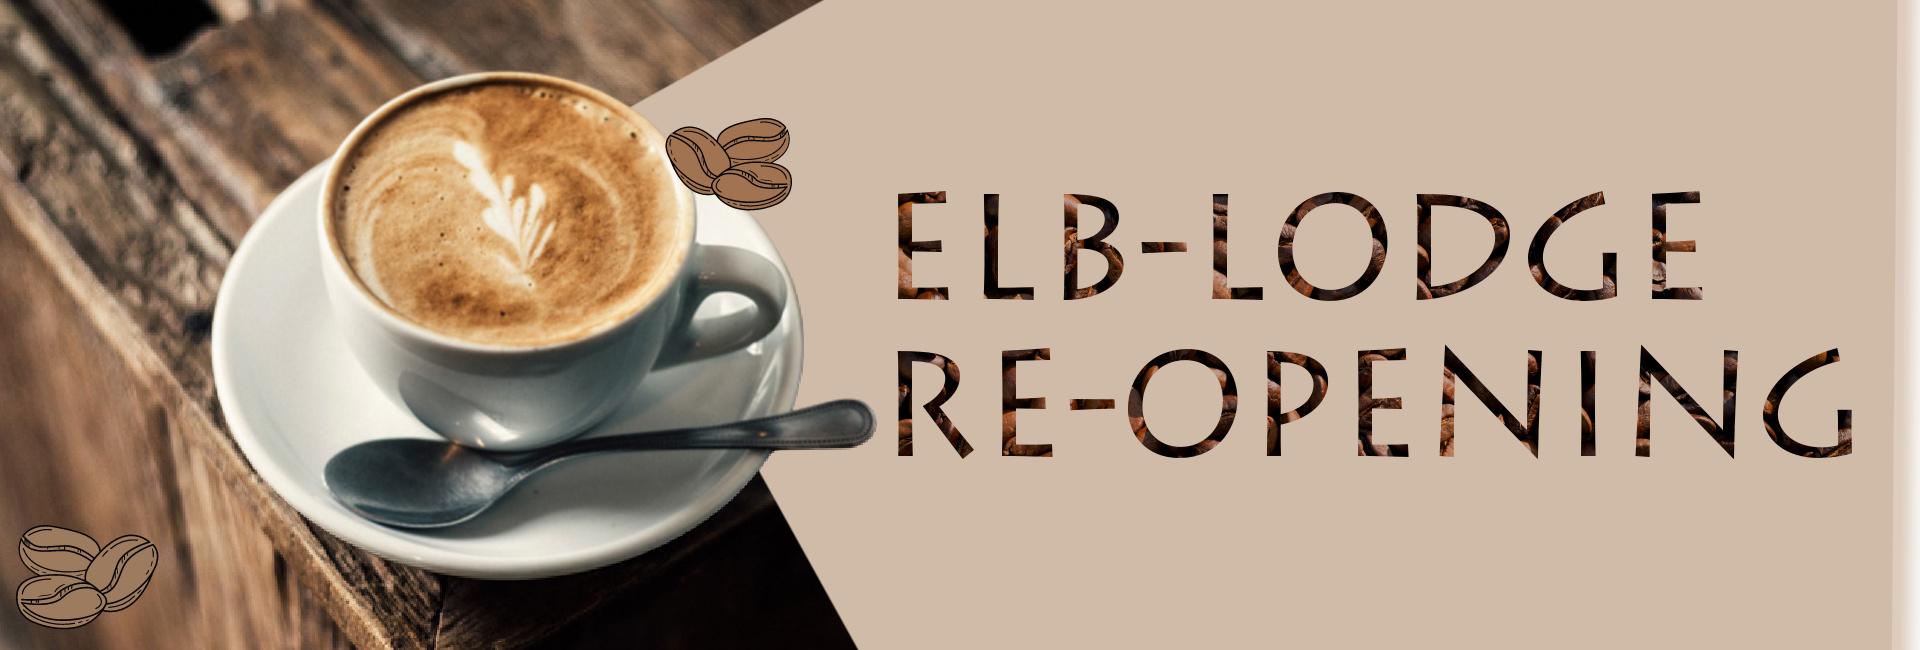 Elb-Lodge